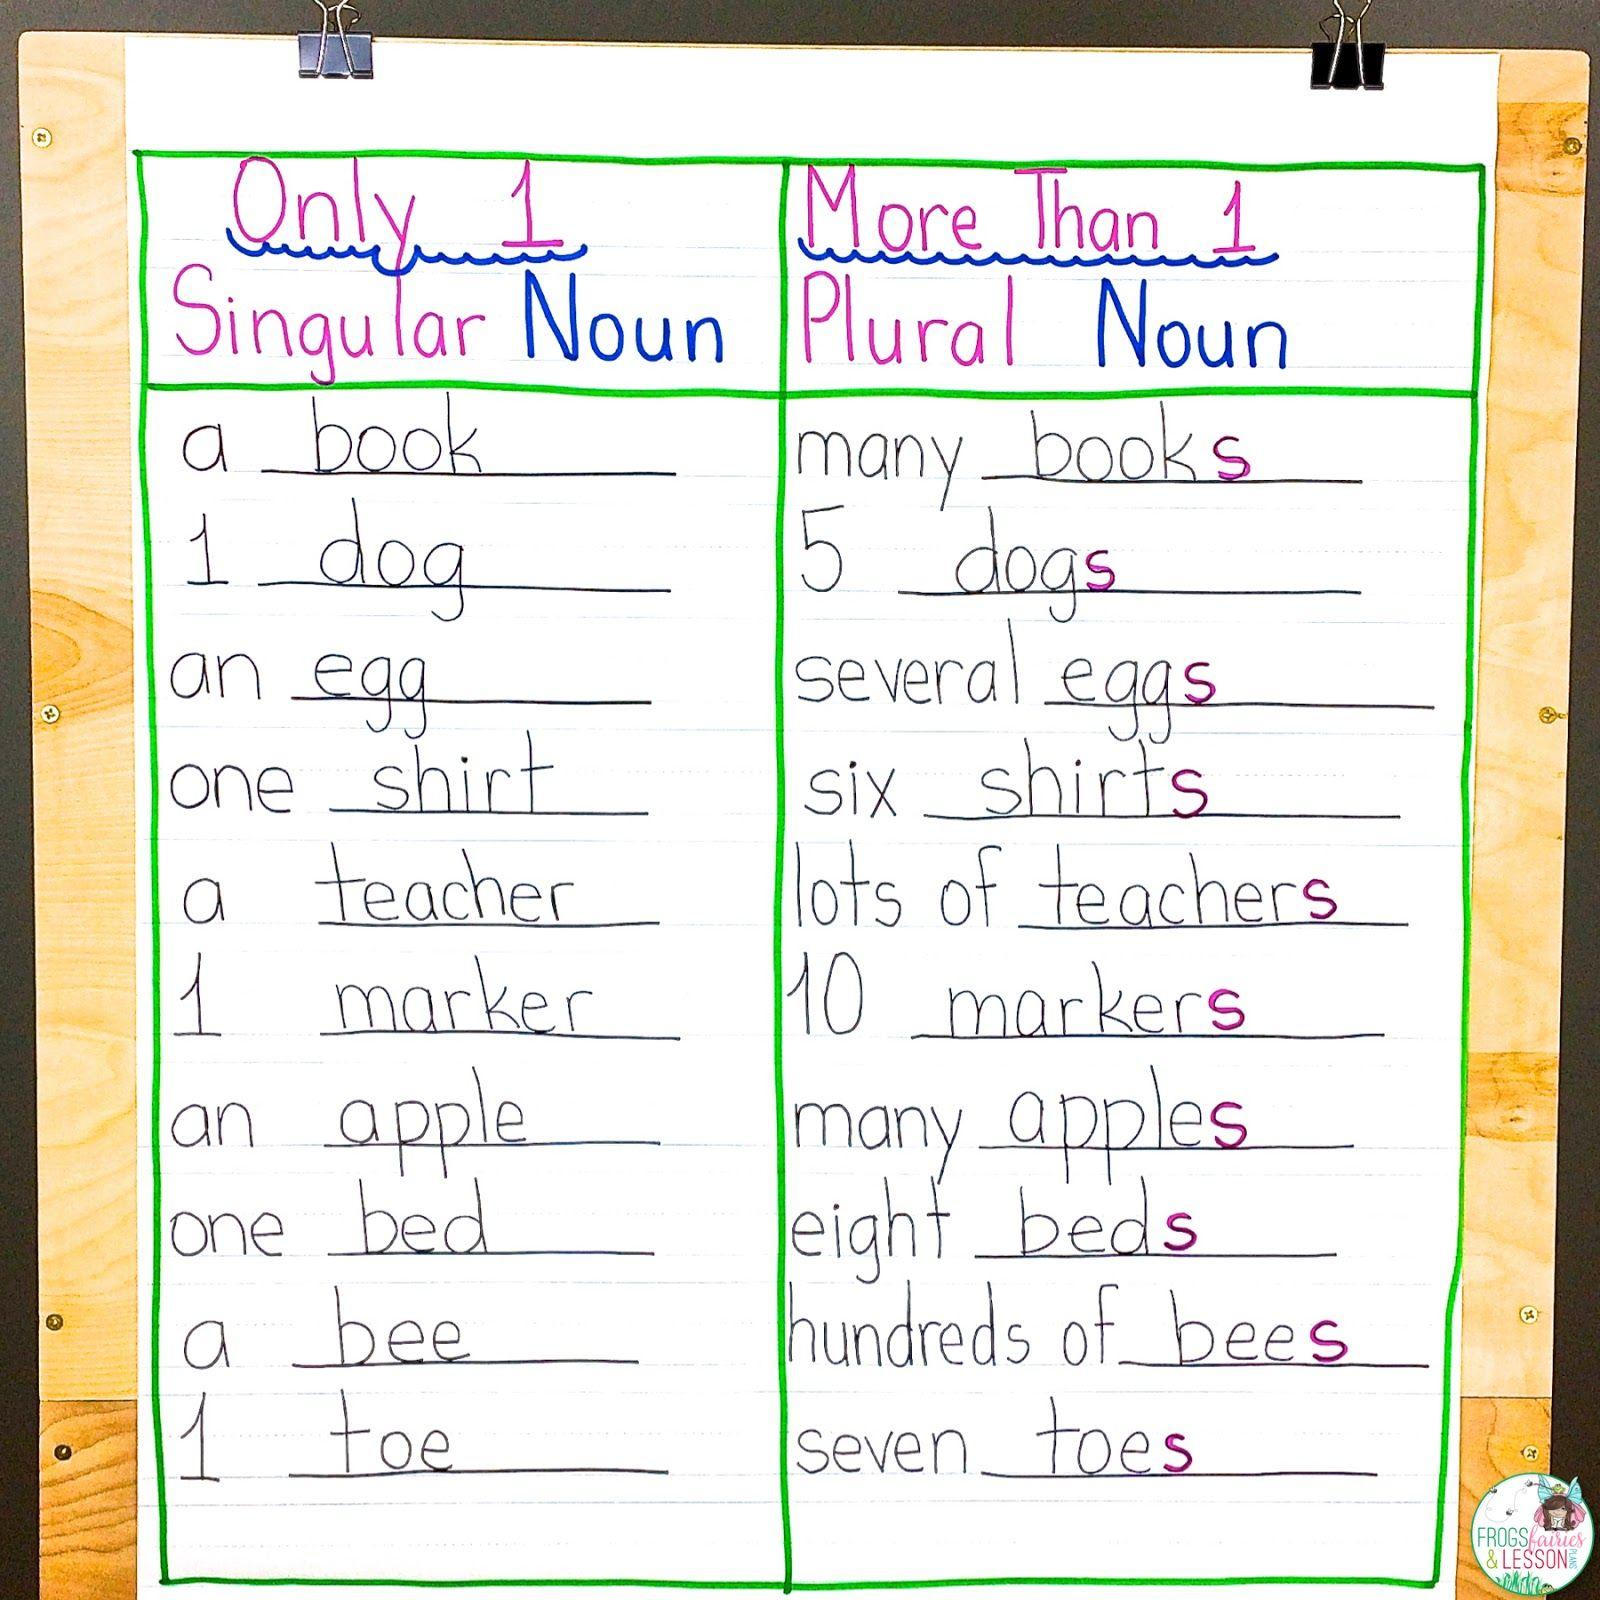 5 Noun Lessons You Need To Teach In 1st Grade Part 2 Nouns Lesson Plurals Noun Anchor Charts [ 1600 x 1600 Pixel ]